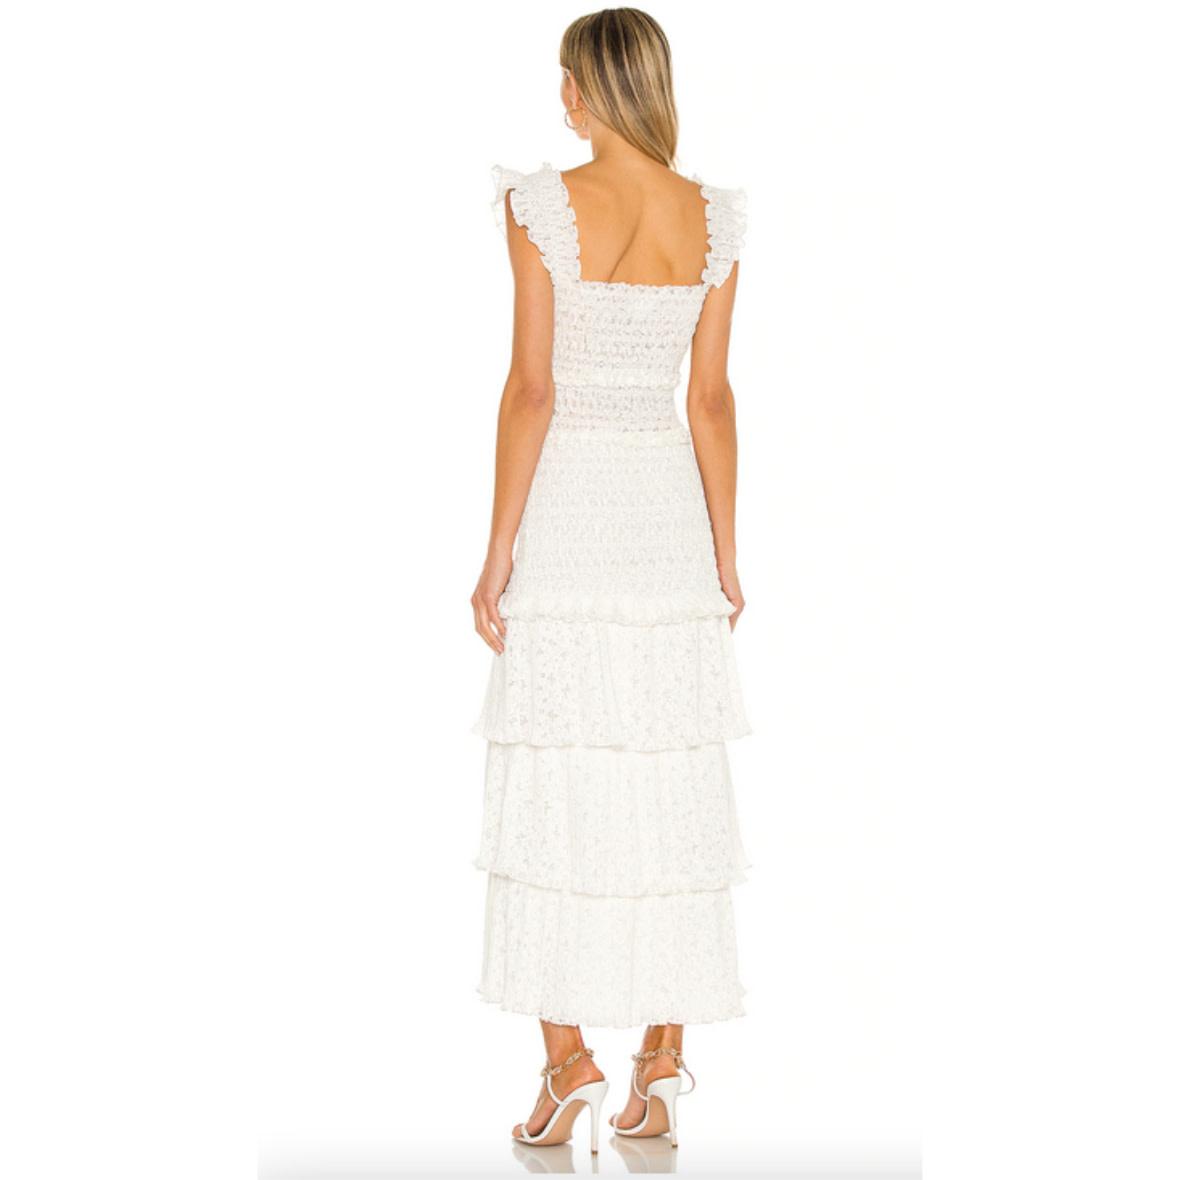 Saylor Saylor Perrie Dress